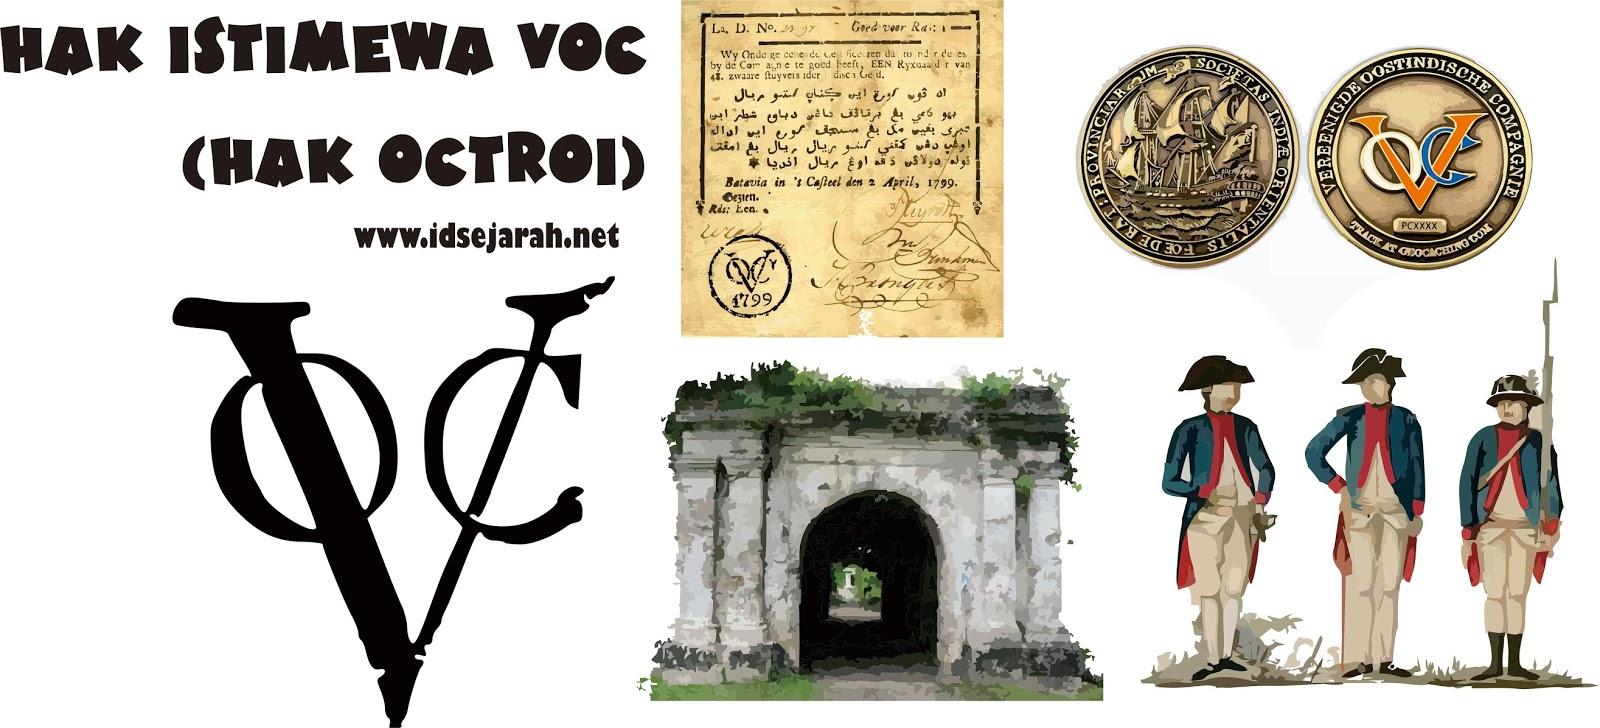 Sejarah VOC di Indonesia - Idsejarah.net